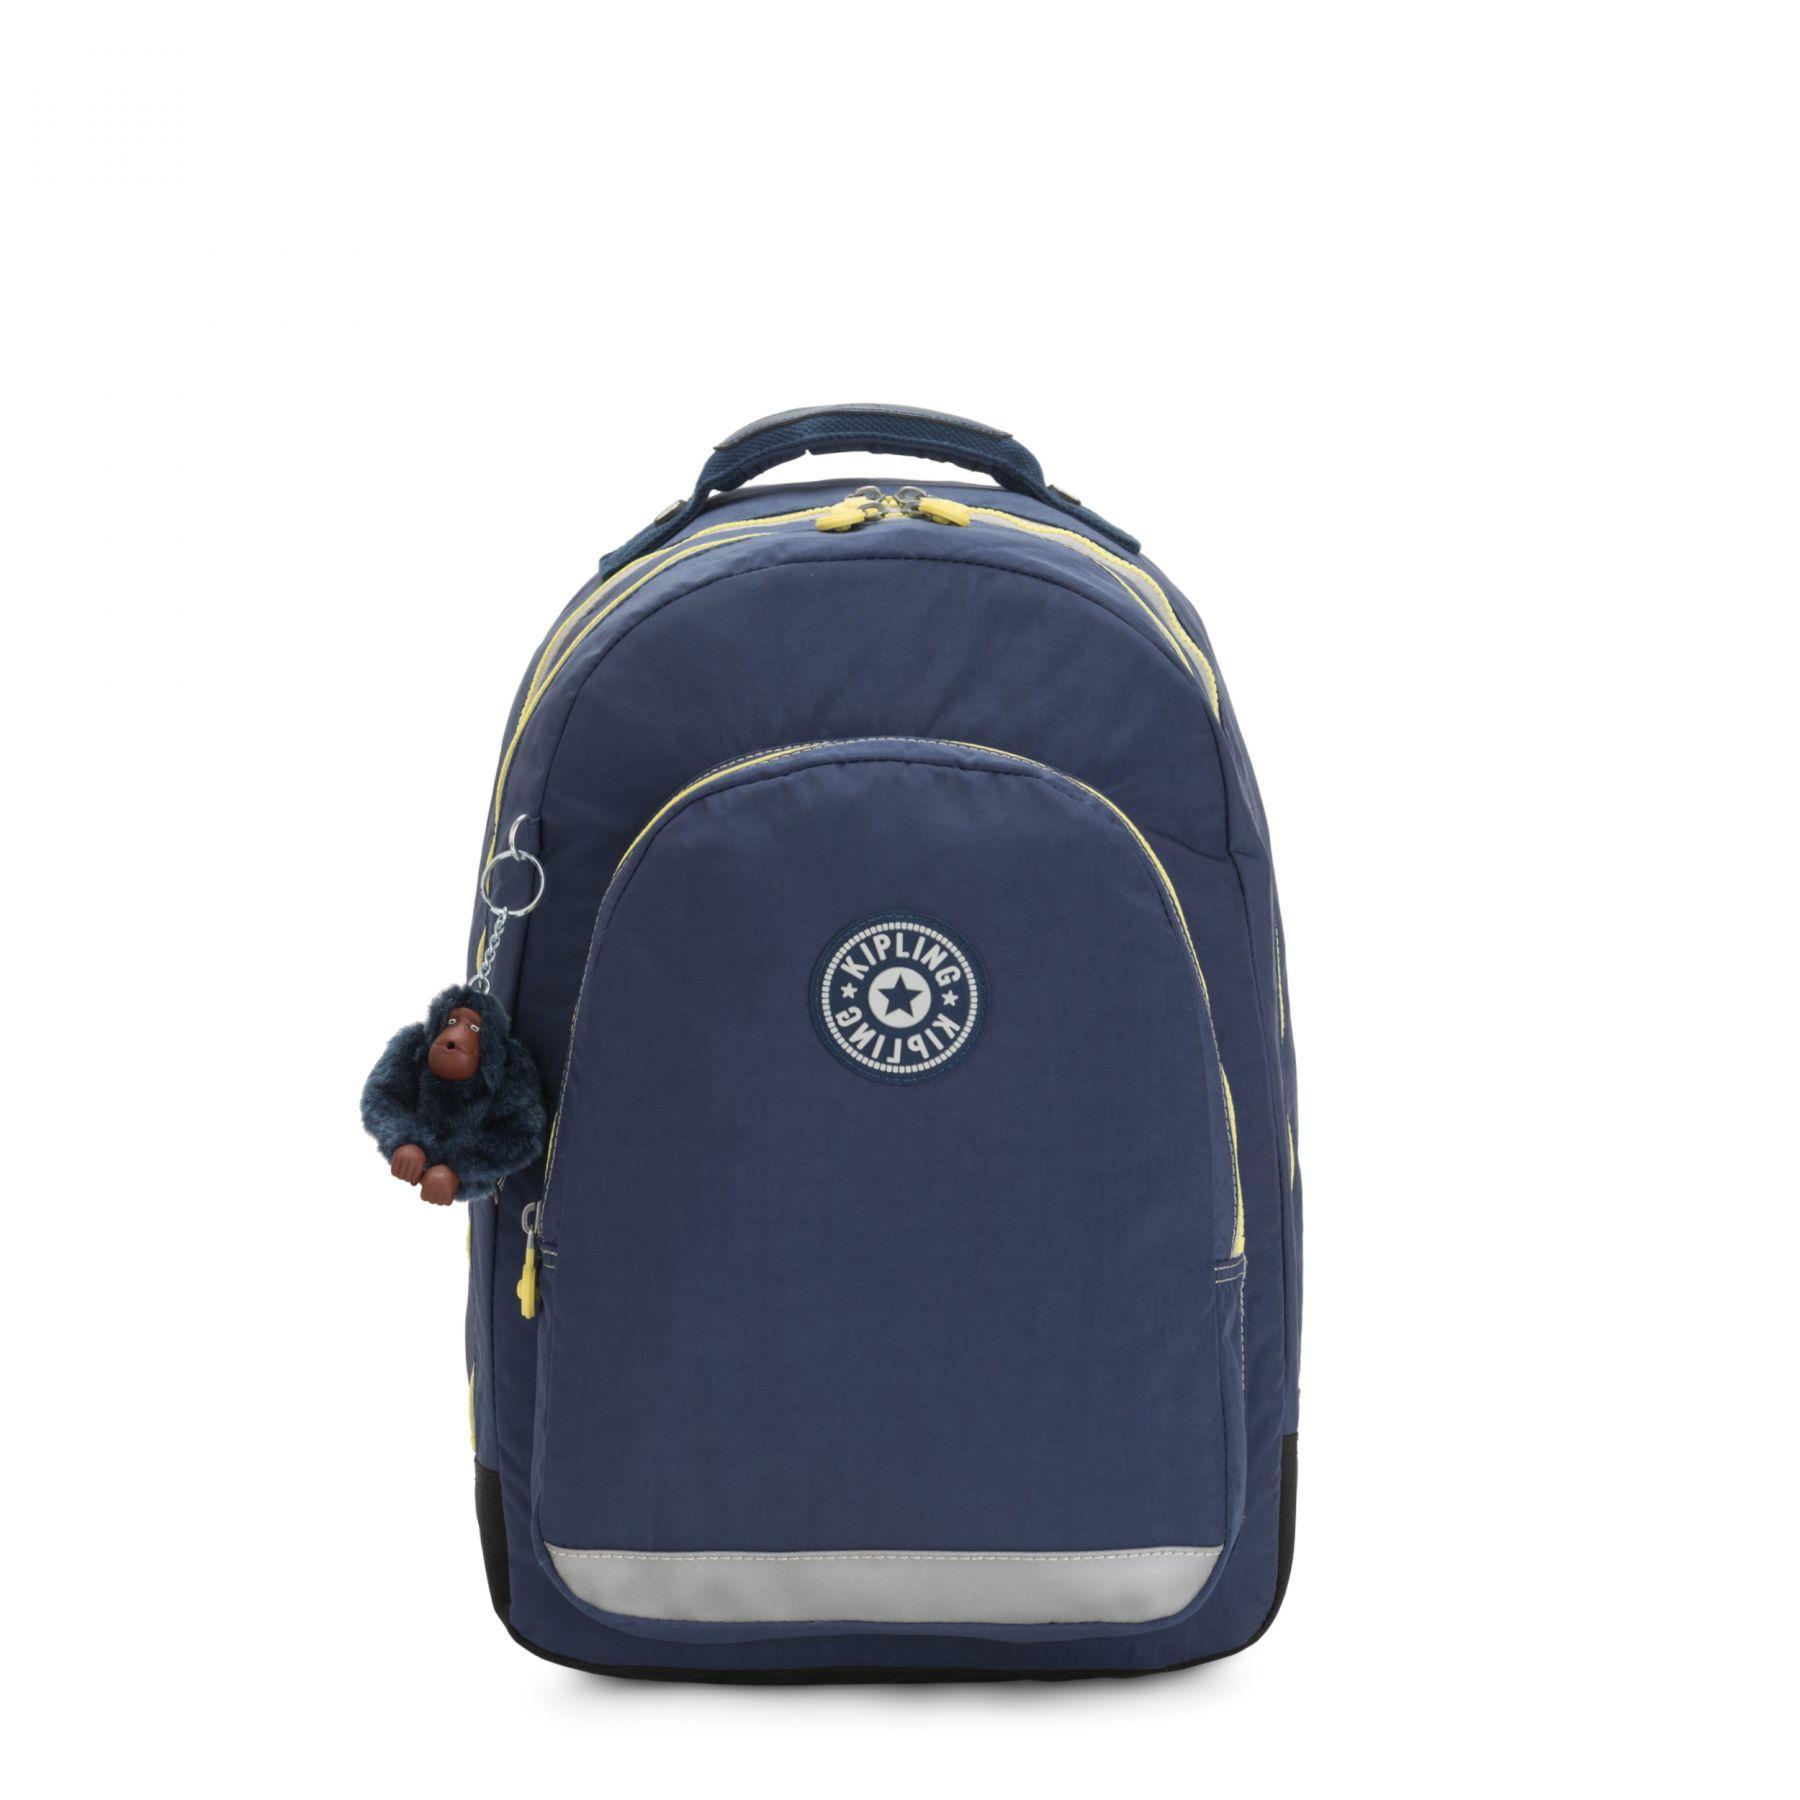 CLASS ROOM BLUE THUNDER